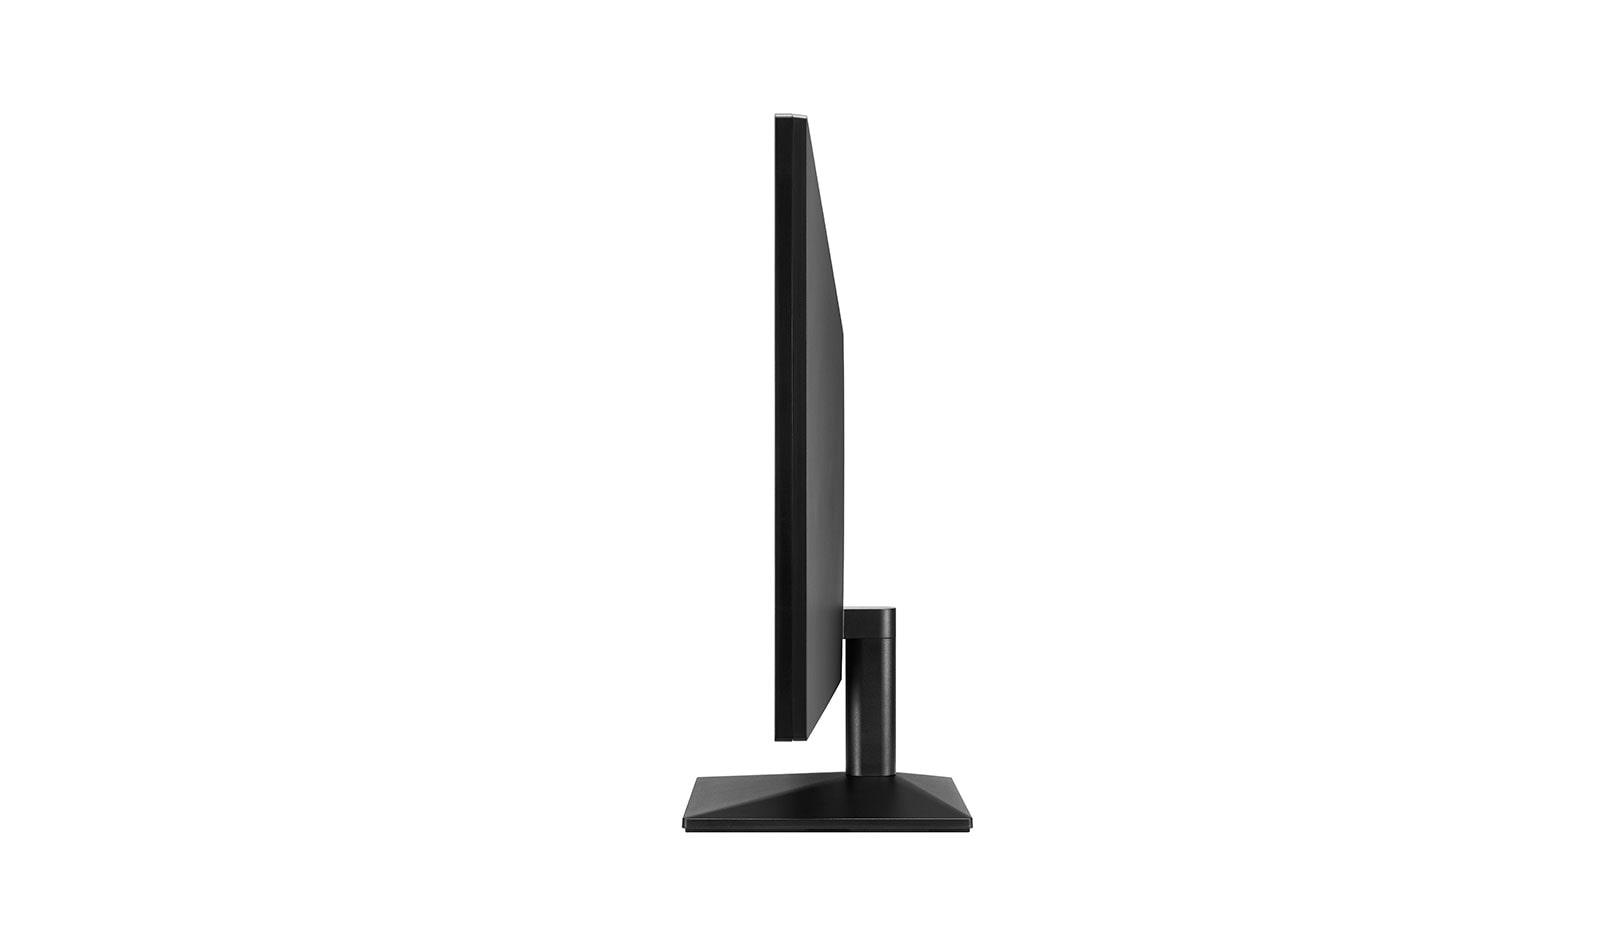 LG Monitores 27MK400H-B 6